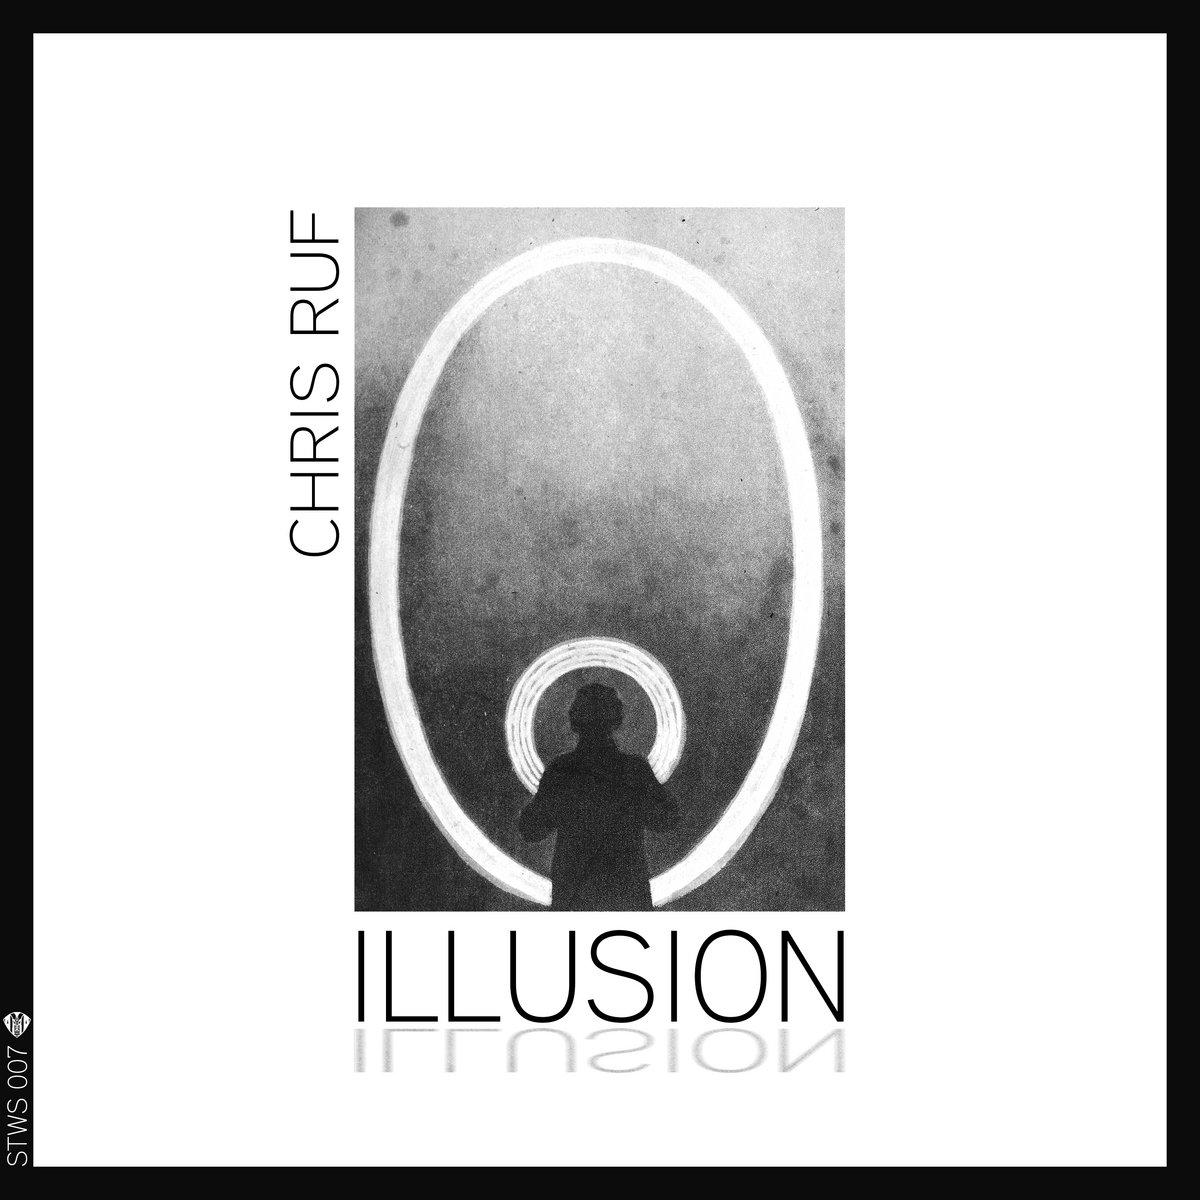 Illusion by Chris Ruf